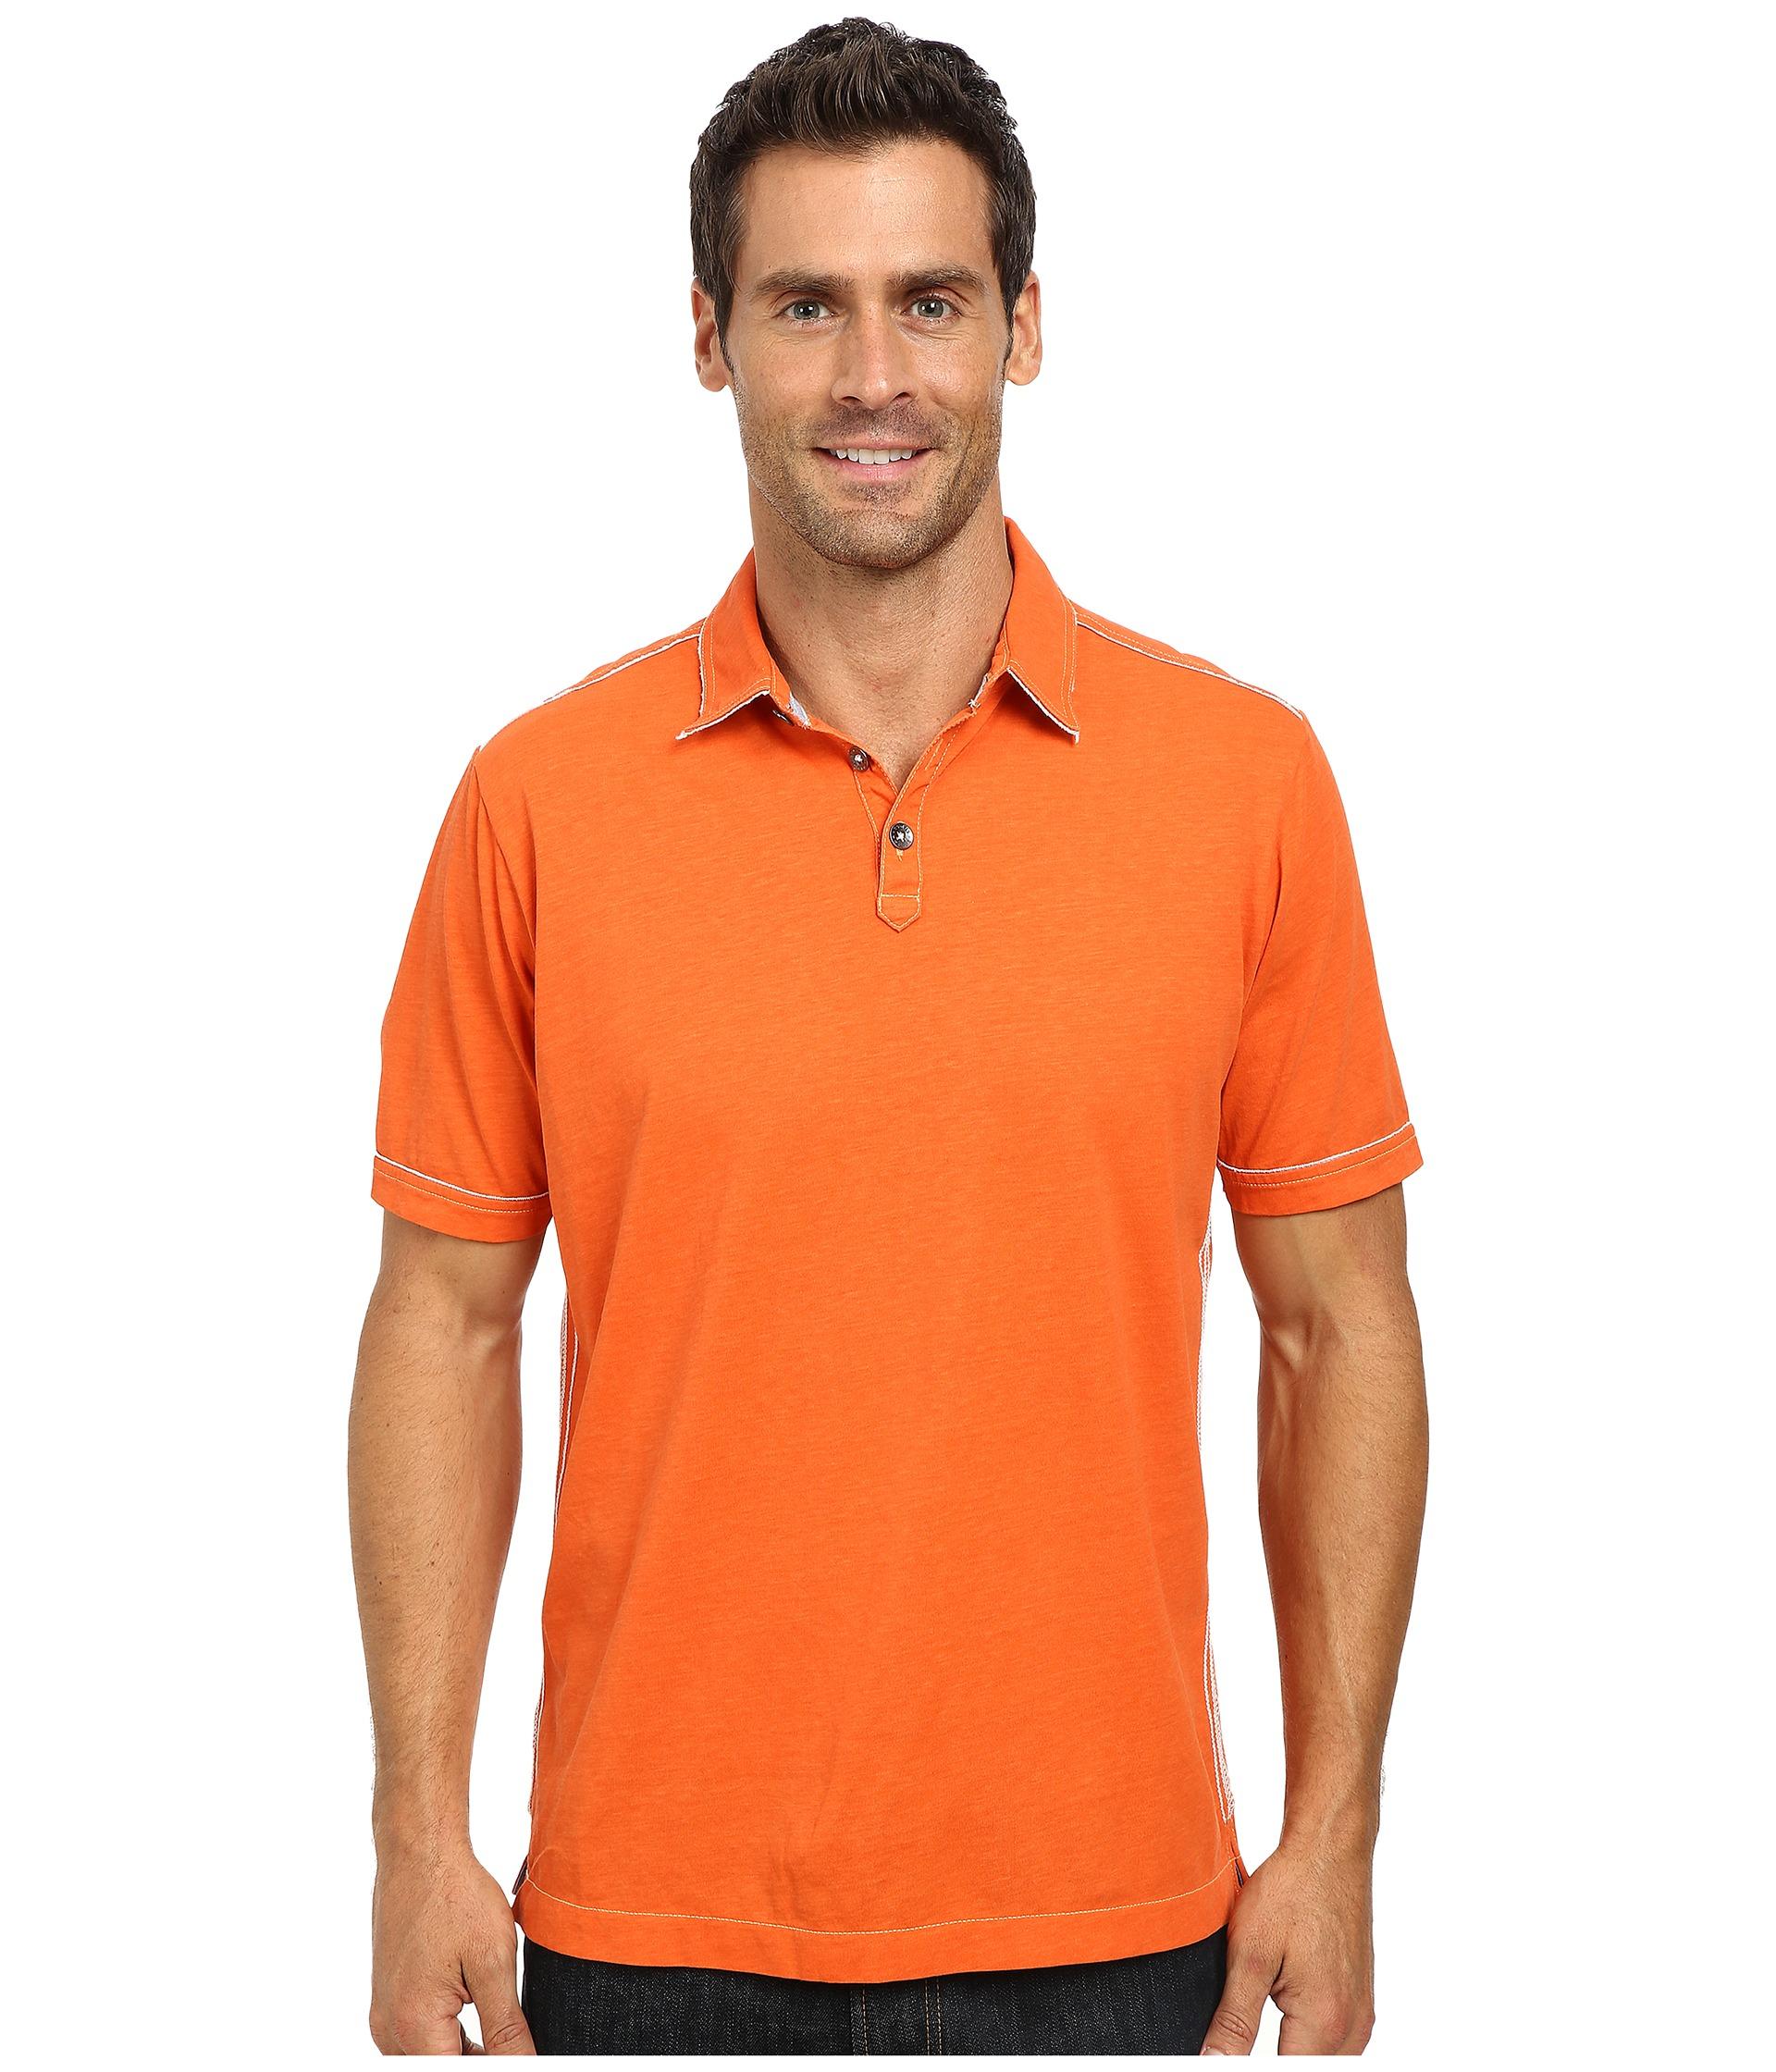 Tommy Bahama New Fray Day Polo In Orange For Men (Daytona